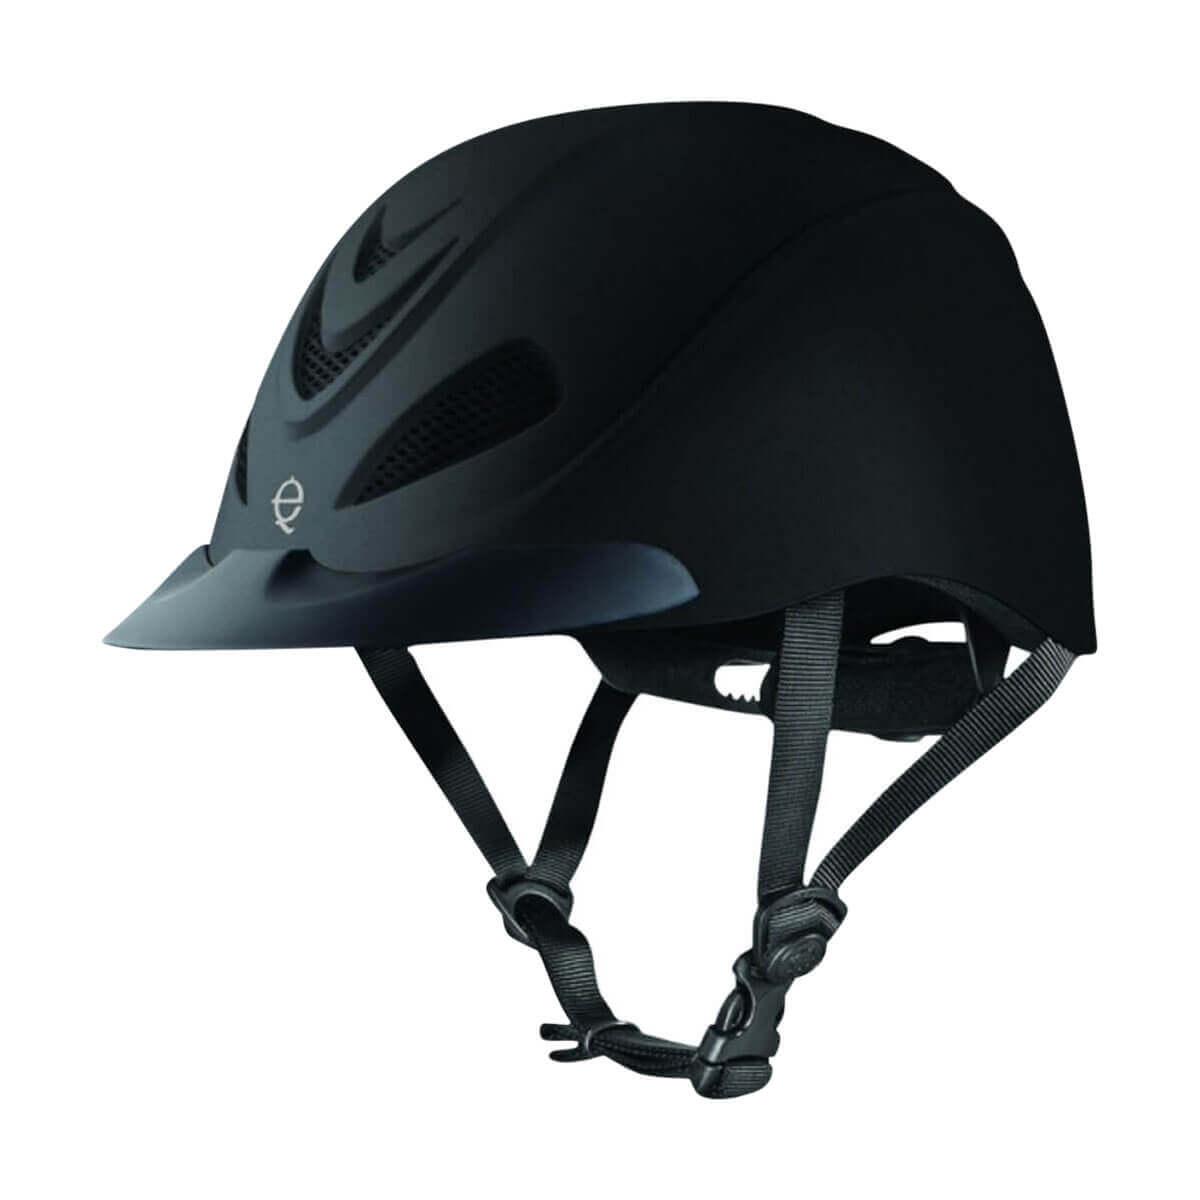 Troxel Liberty Low Profile Schooling Helmet - MEDIUM